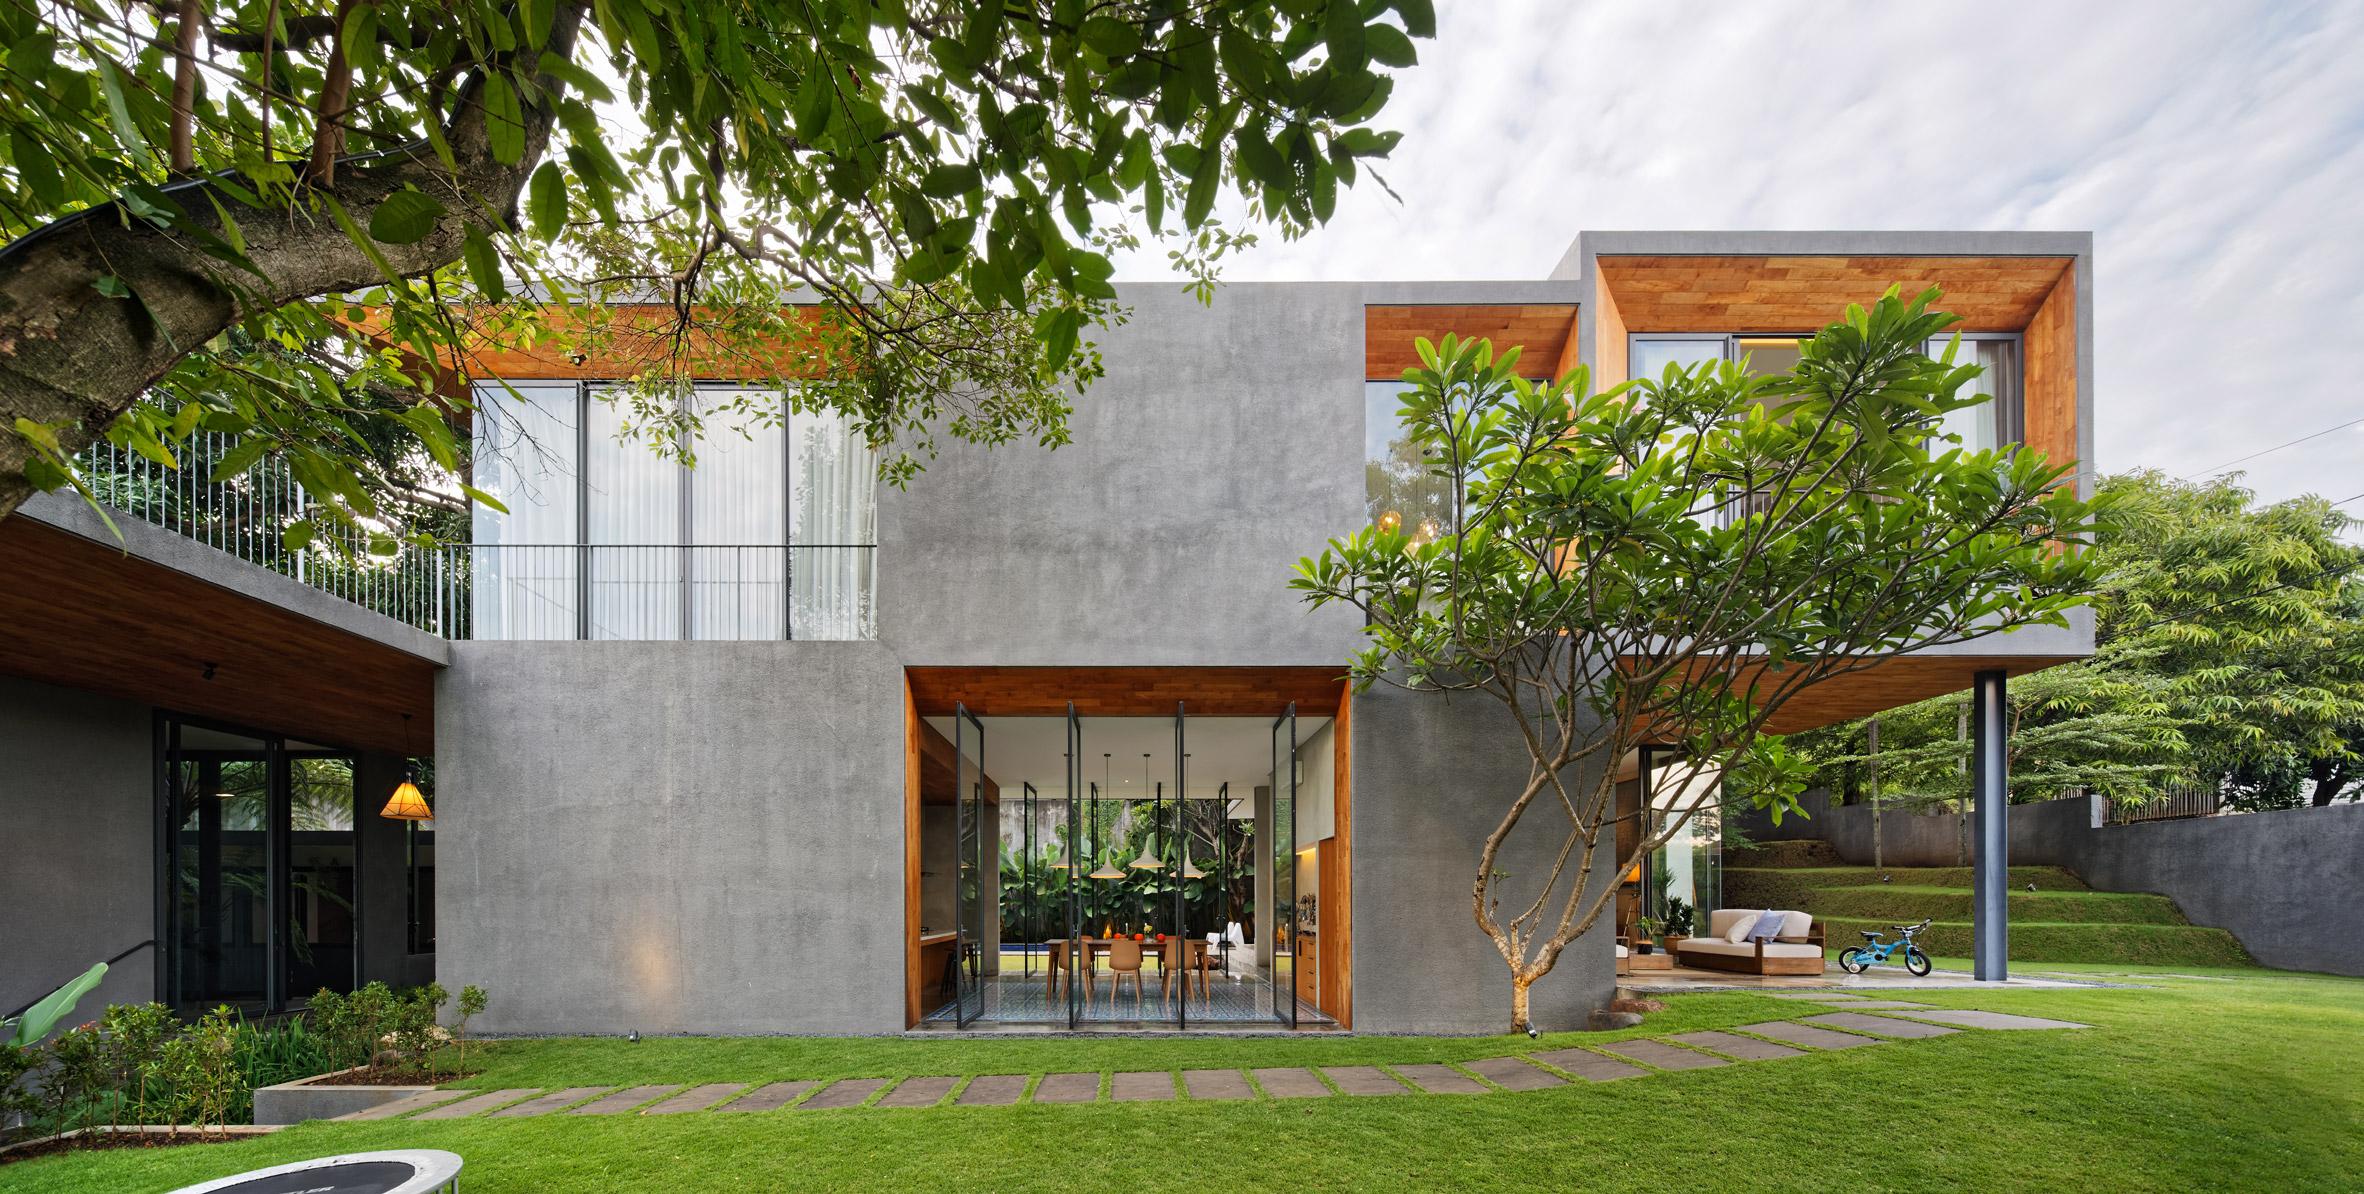 house-inside-outside-tamara-wibowo-architecture-residential-indonesia_dezeen_2364_col_8.jpg